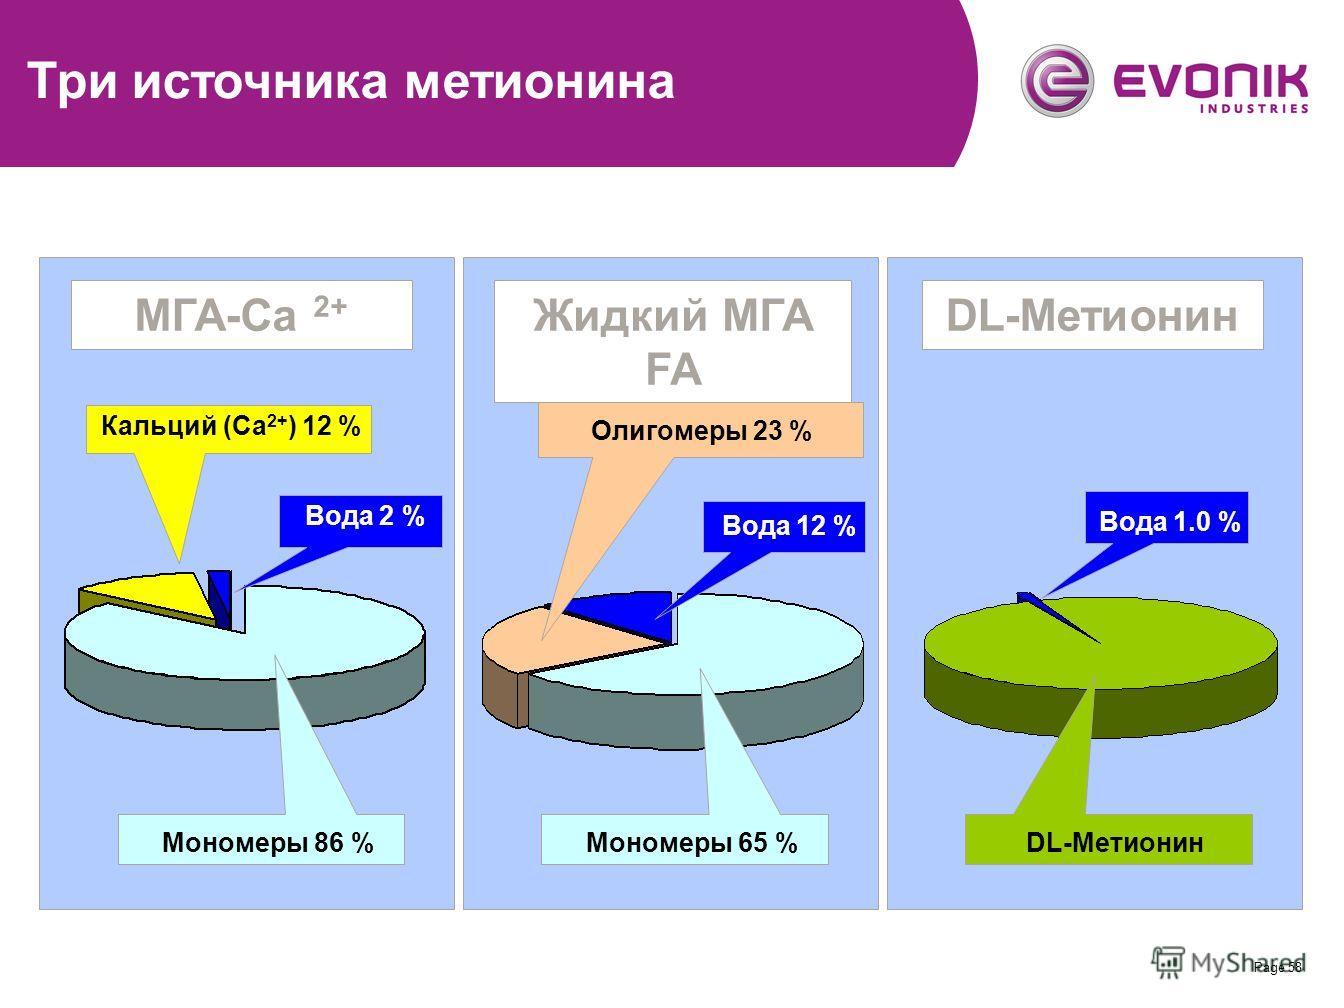 Page 58 MHA-Ca 2+ -Salt - theoretical composition Кальций (Ca 2+ ) 12 % Мономеры 86 % Вода 2 % MГА-Ca 2+ DL-Метионин Вода 1.0 % DL-Метионин Олигомеры 23 % Вода 12 % Жидкий МГА FA Мономеры 65 % Три источника метионина